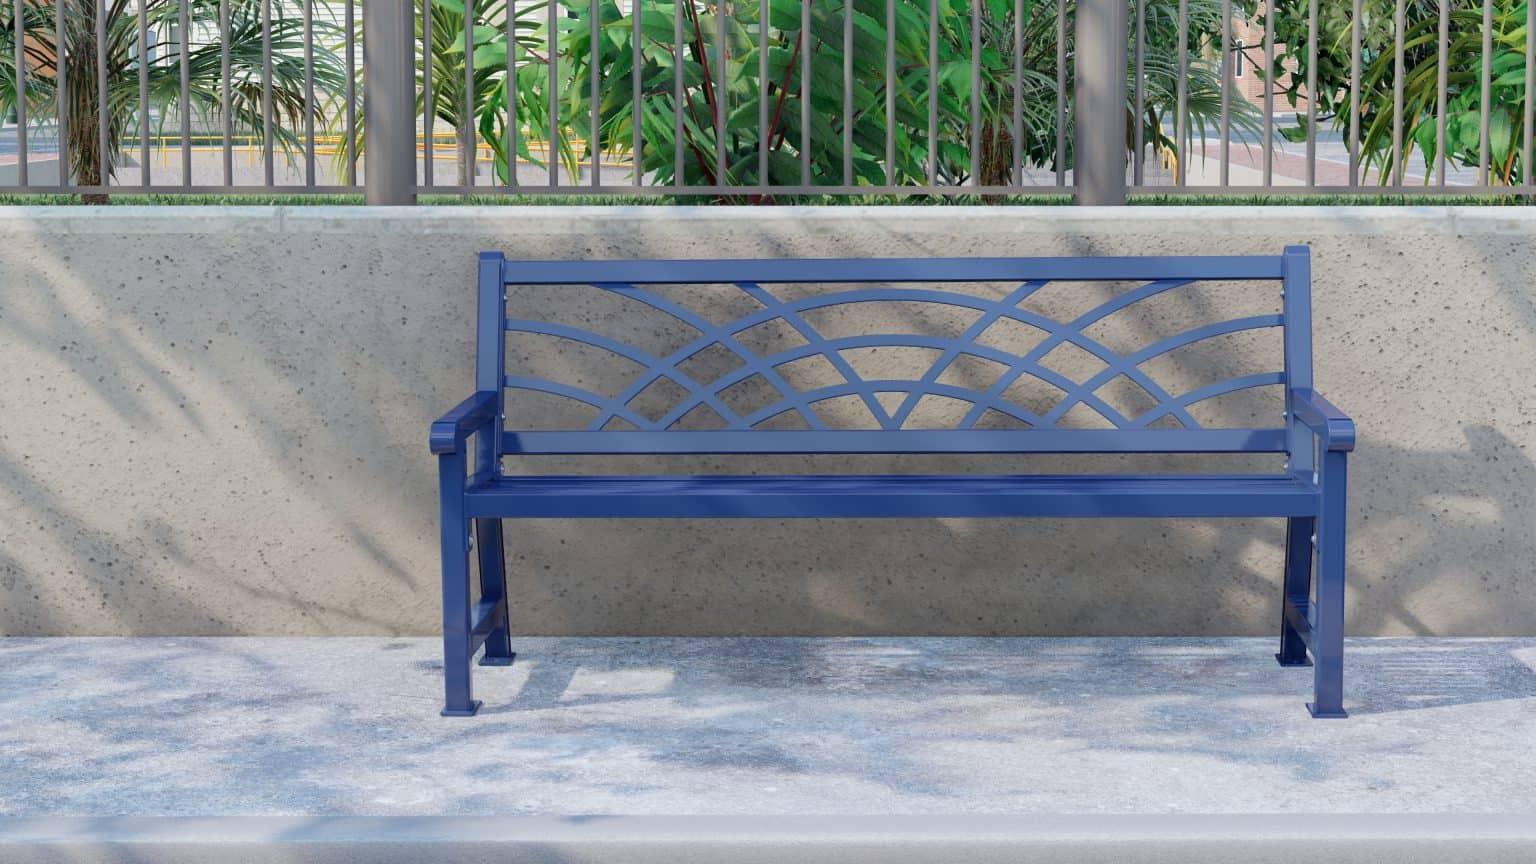 streetscape-furnishings_49643771846_o-1536x864